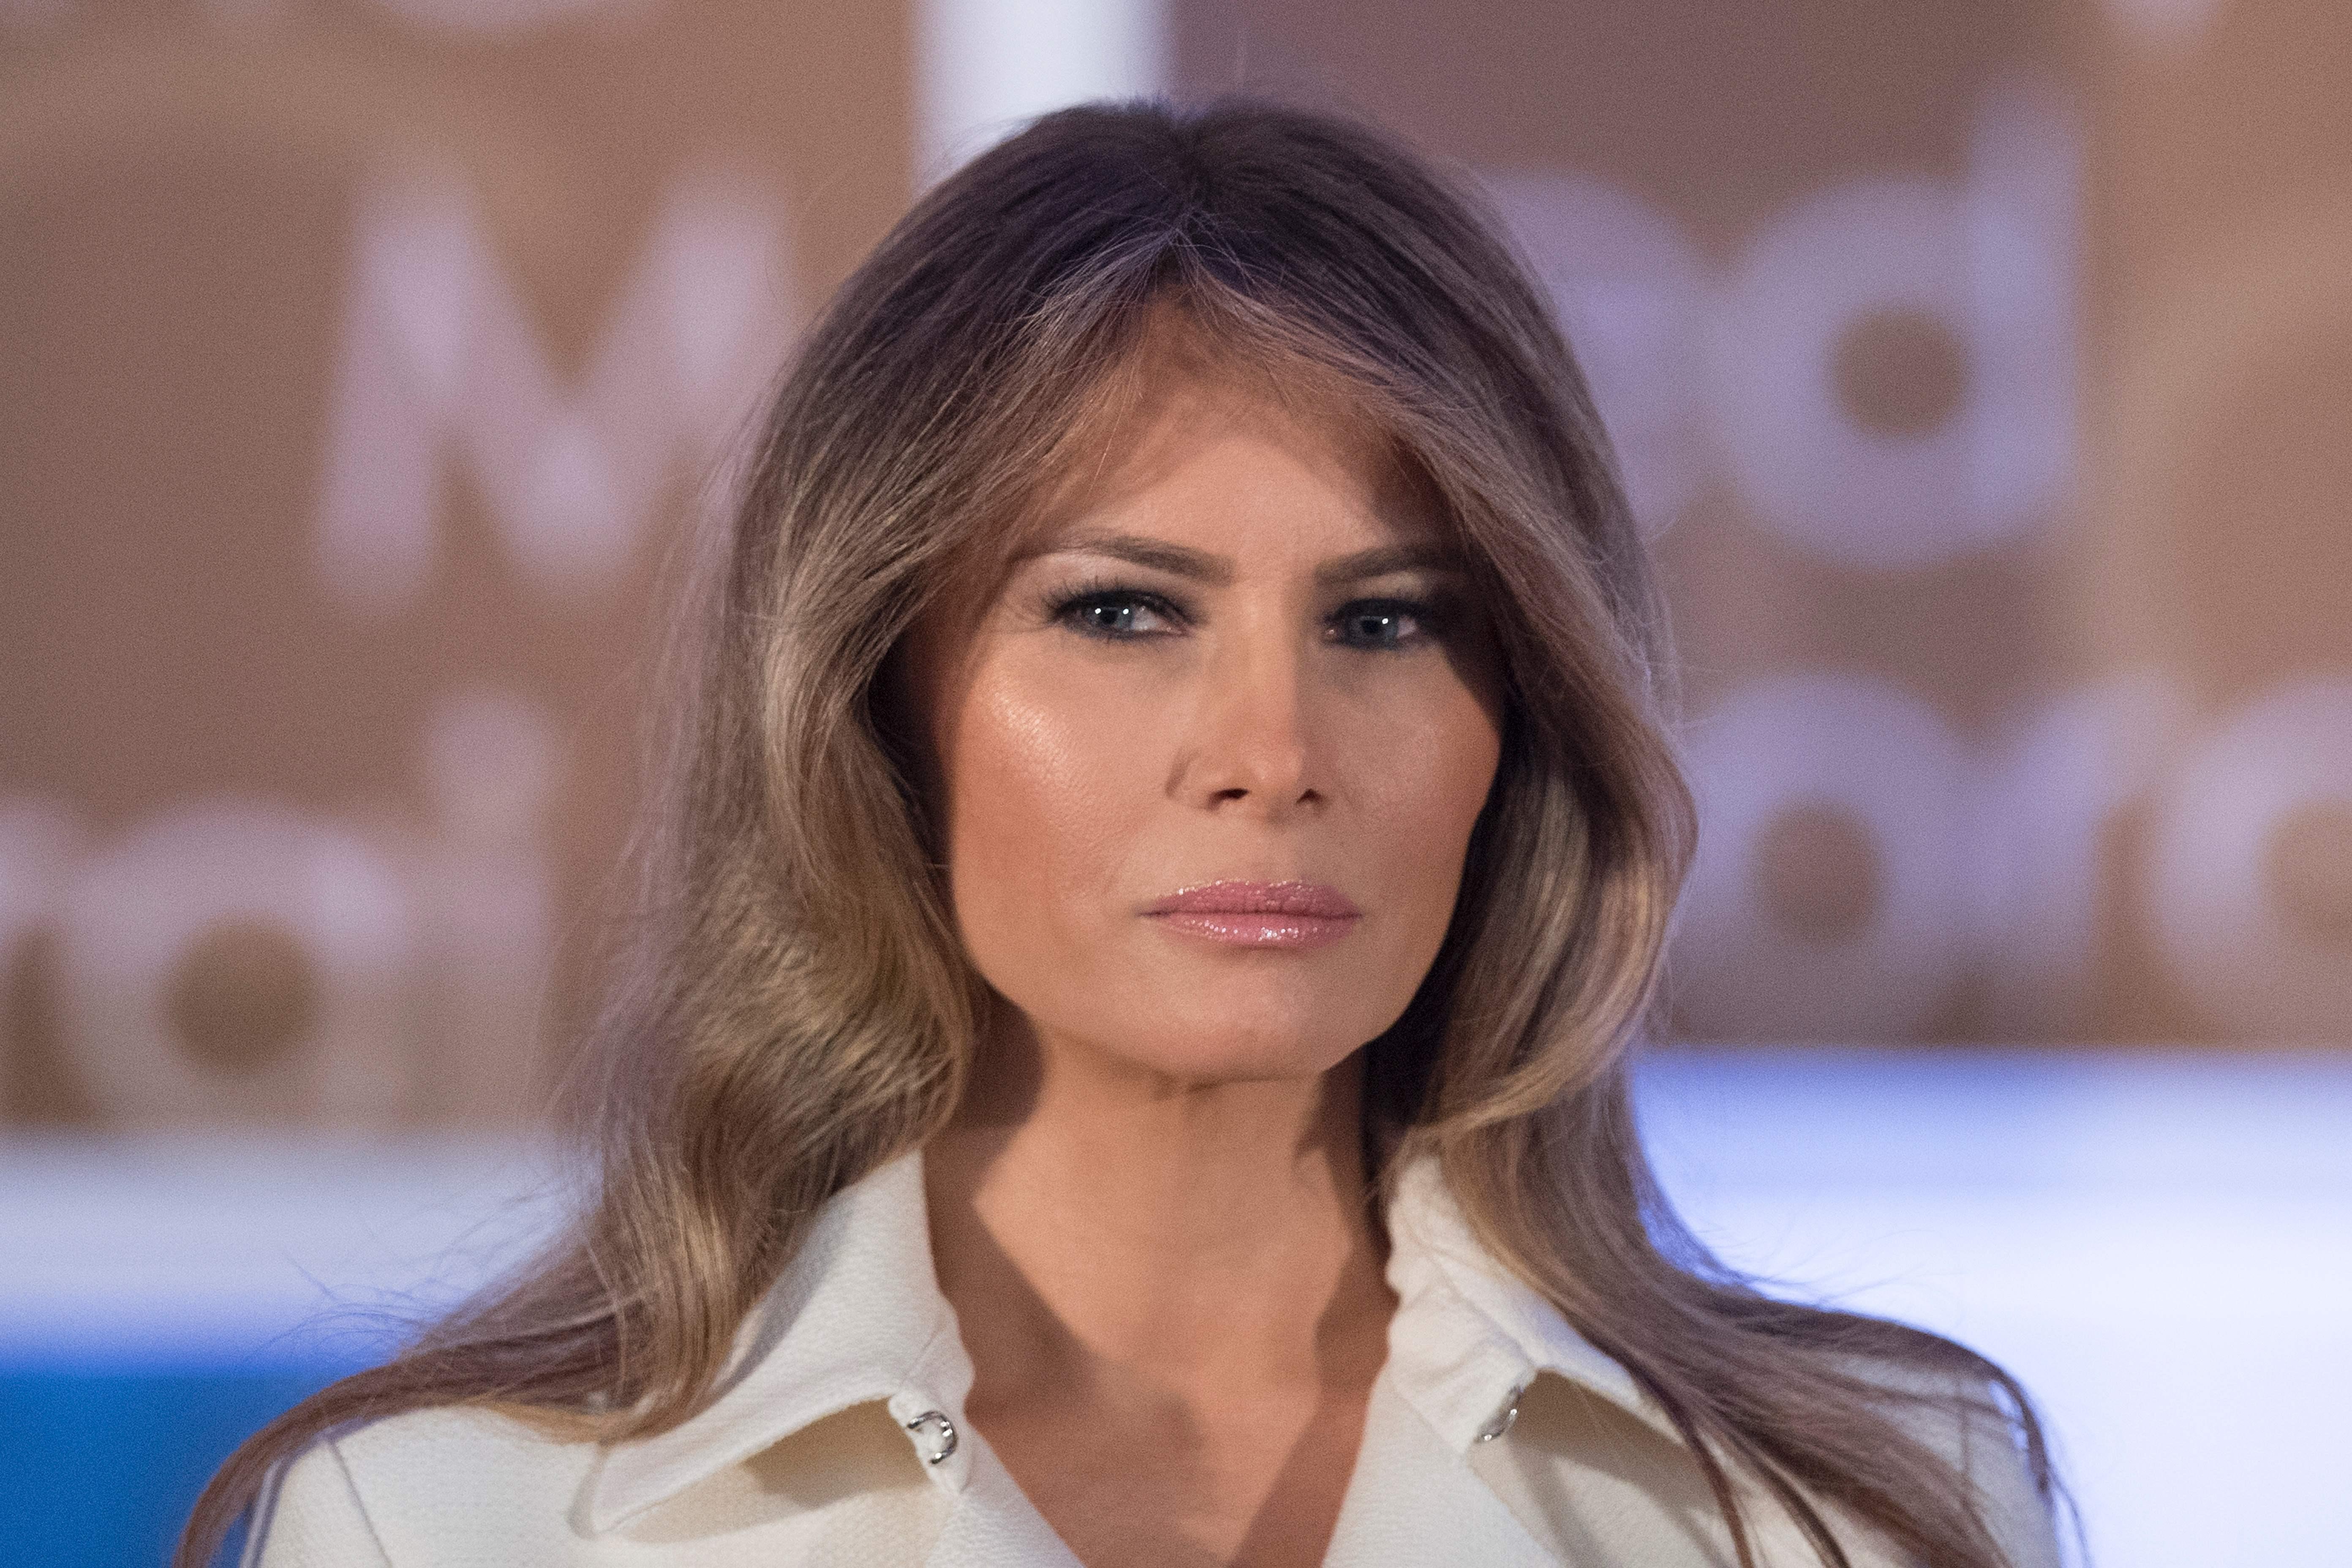 US-politics-TRUMP-AWARD-WOMEN